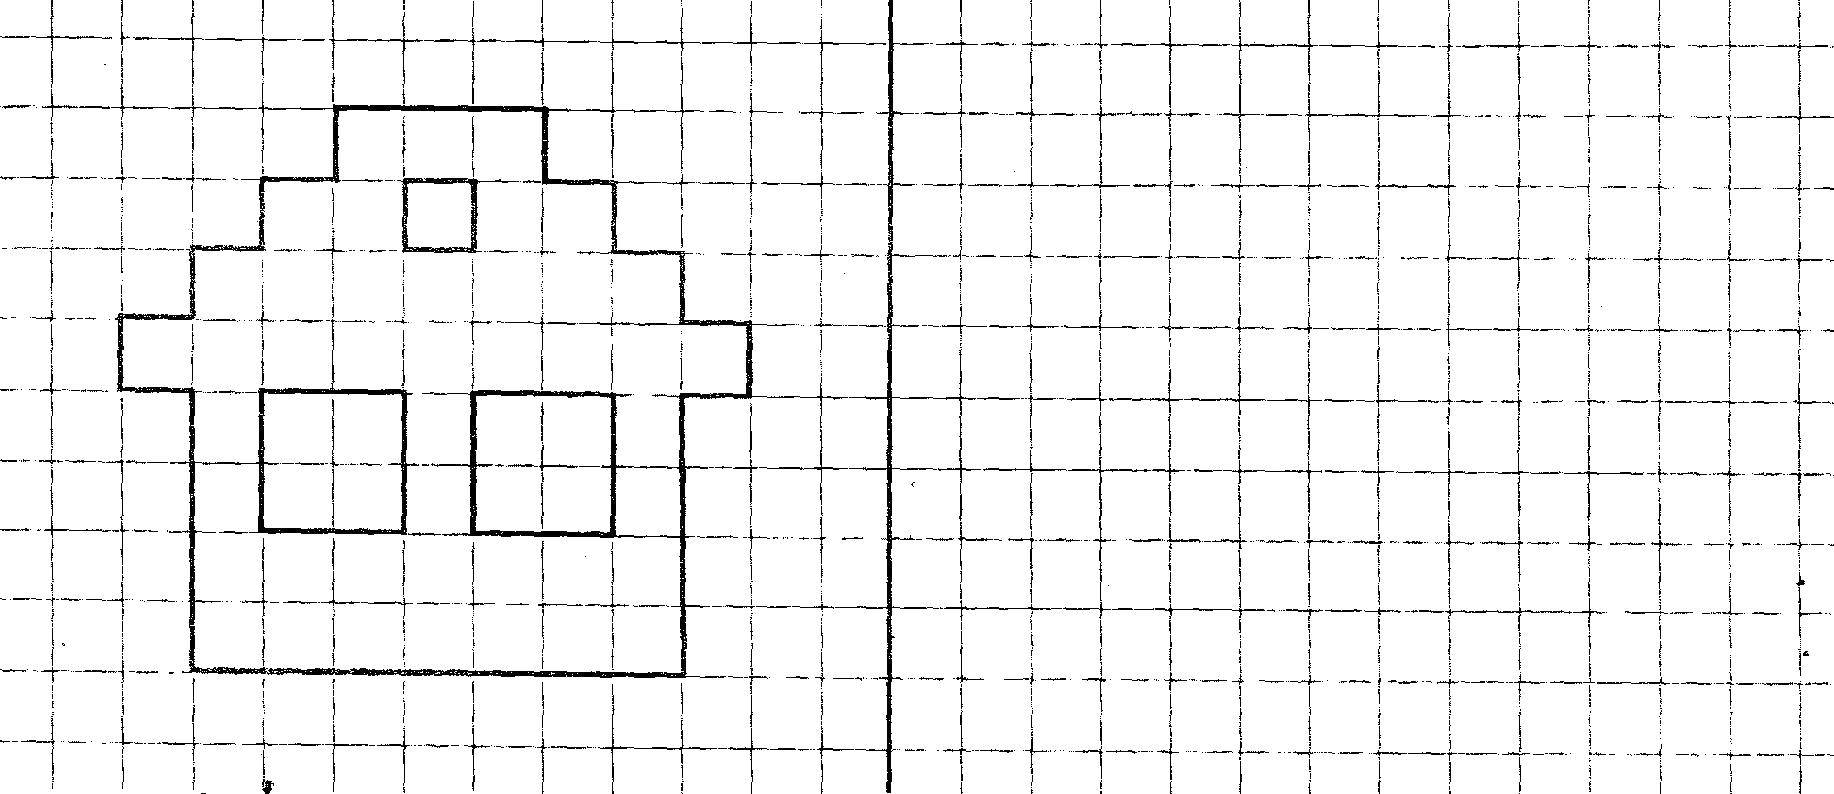 Coloring pages draw on the cells Скачать .  Распечатать